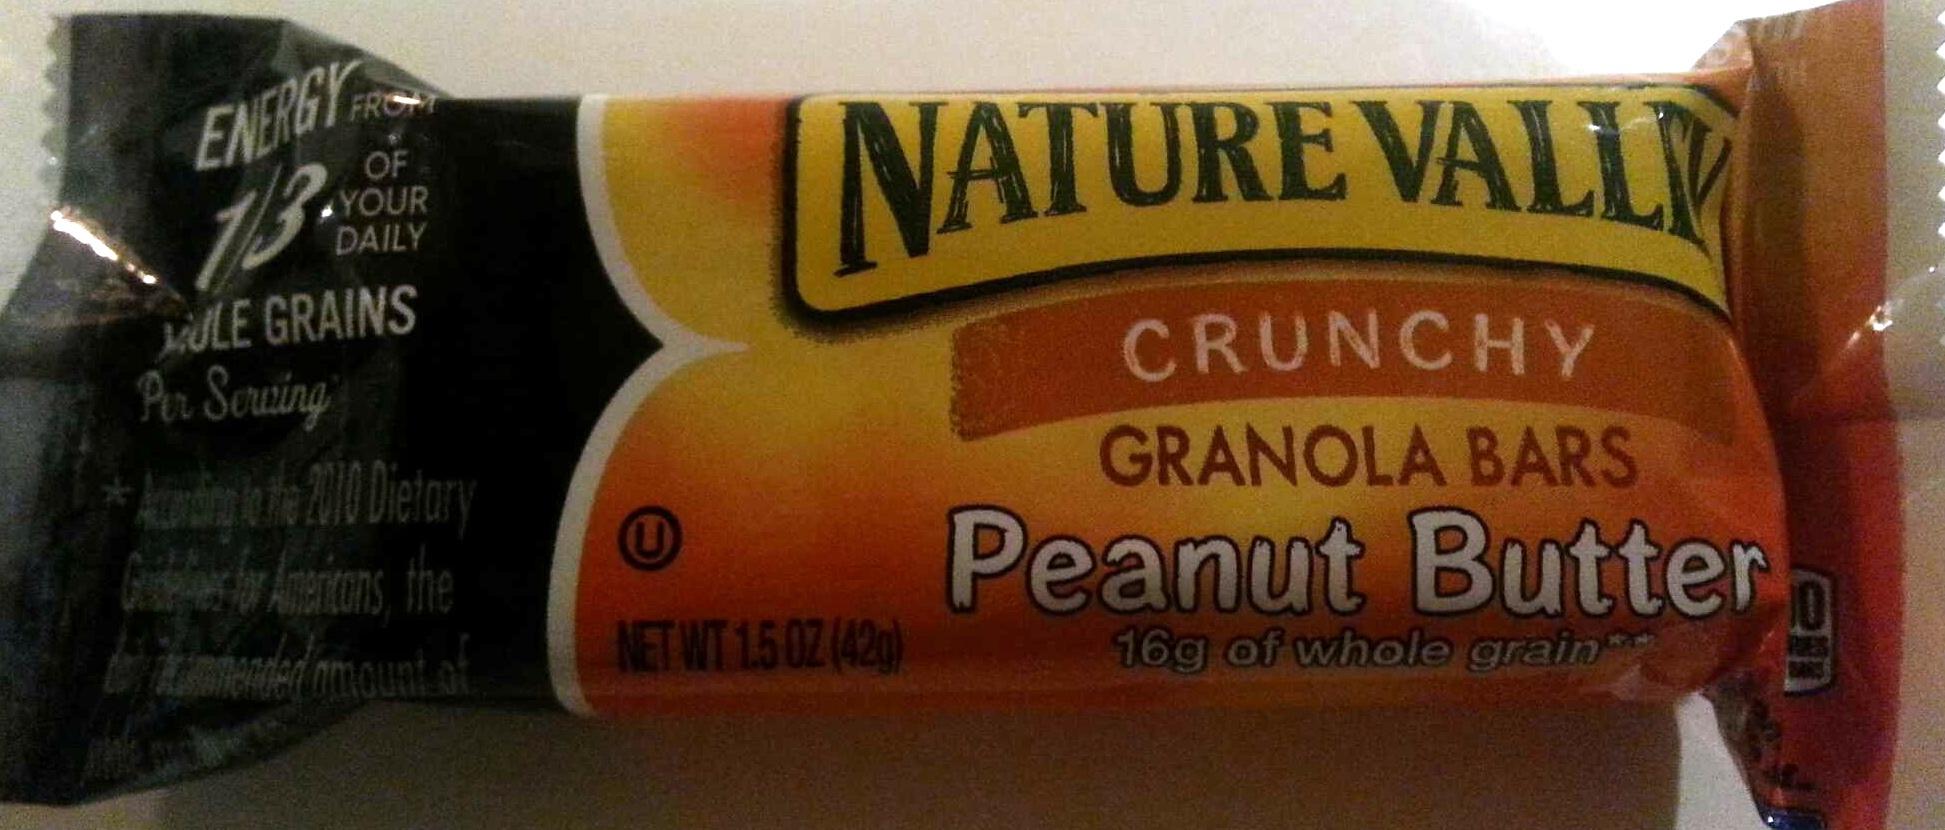 Crunchy Peanut Butter Granola Bars - Product - en